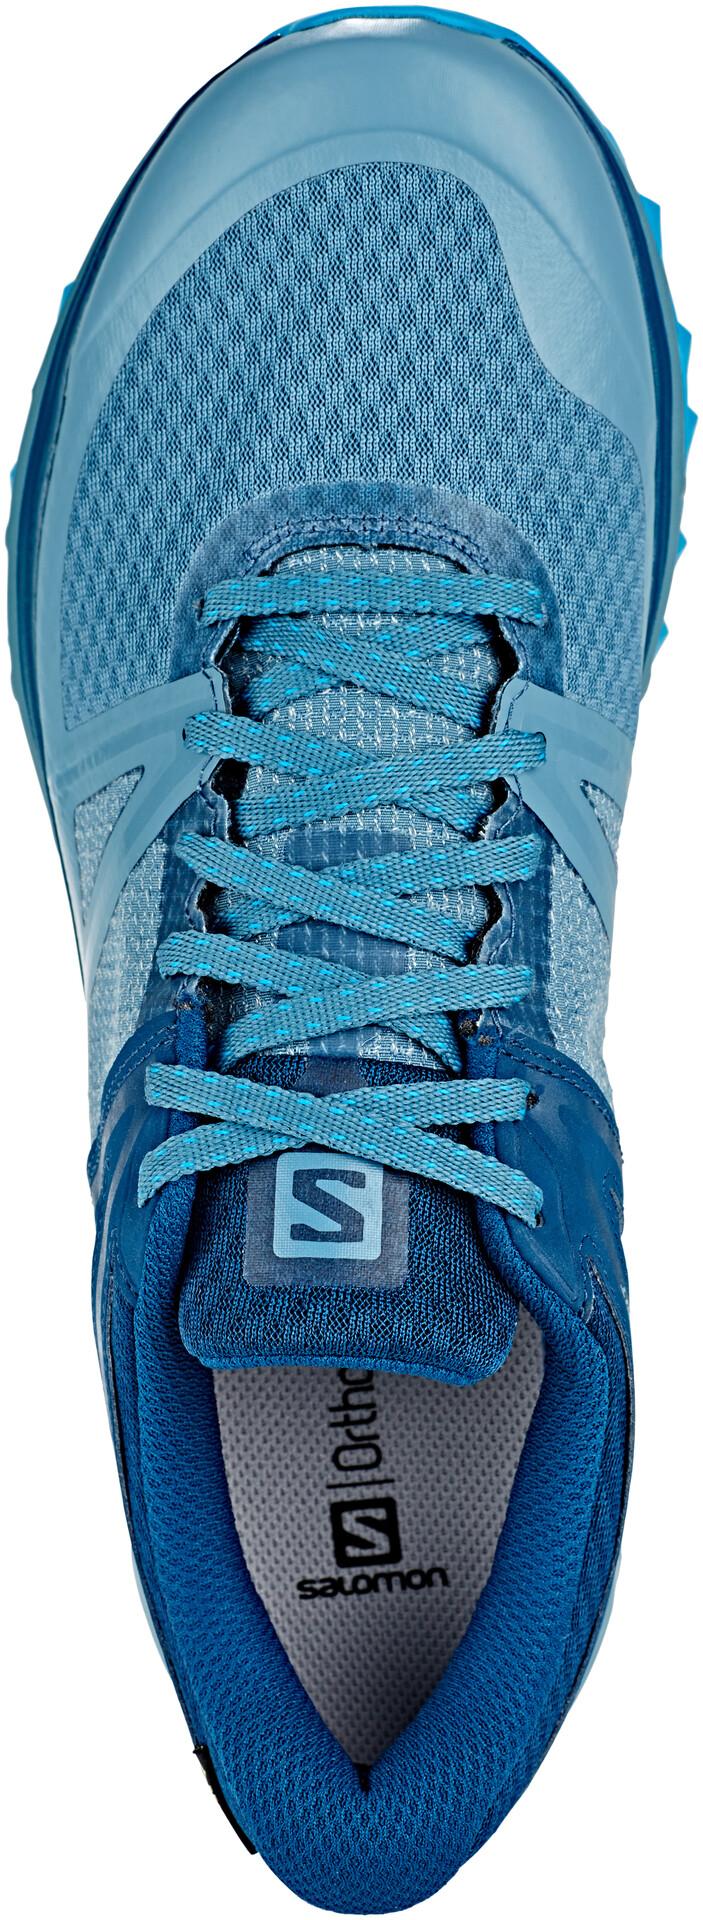 Zapatillas Hombre Salomon Trailster GTX